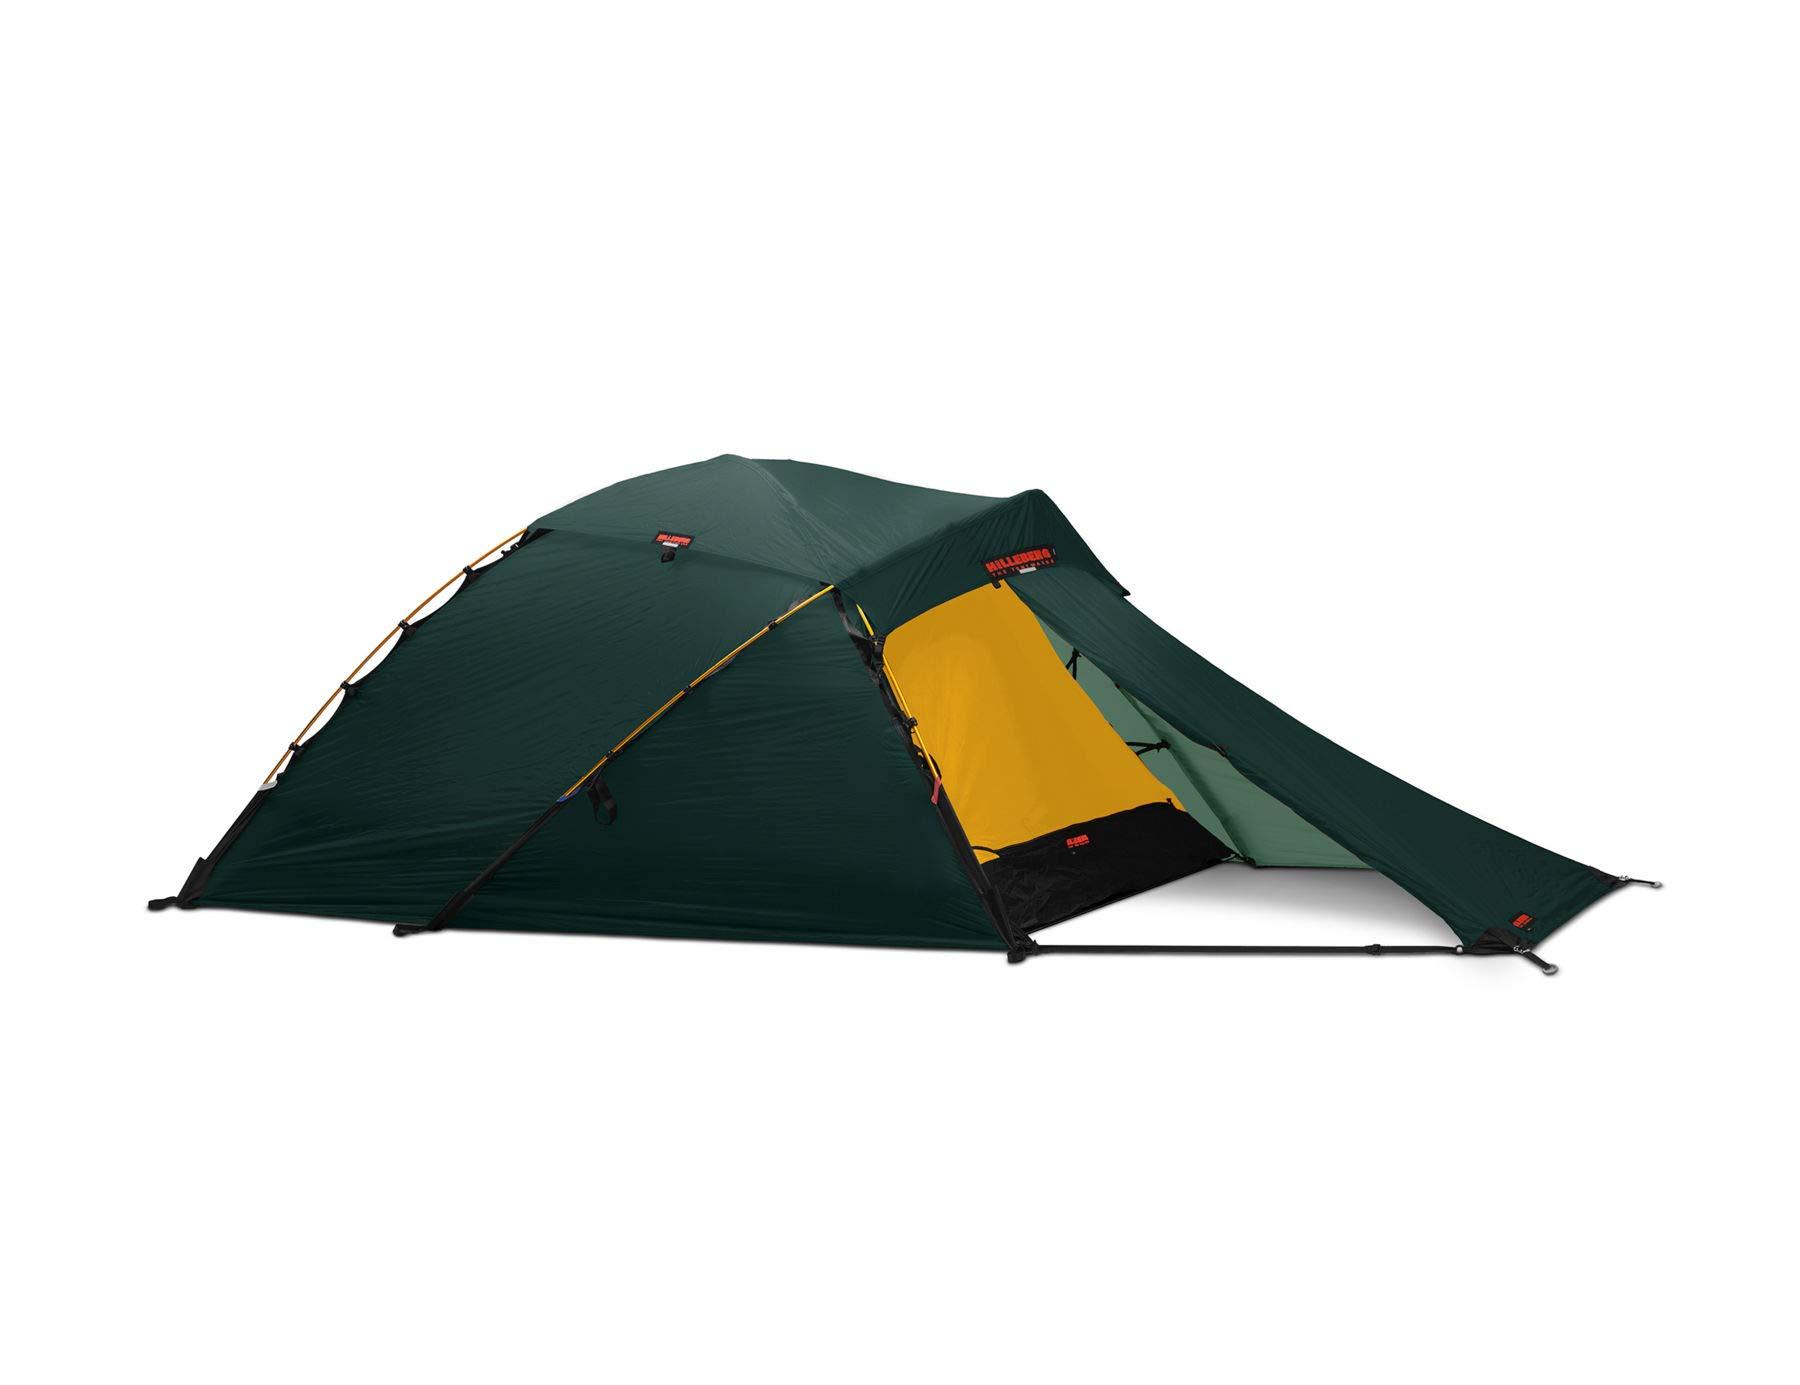 Hilleberg-Jannu-2-Camping-Tent